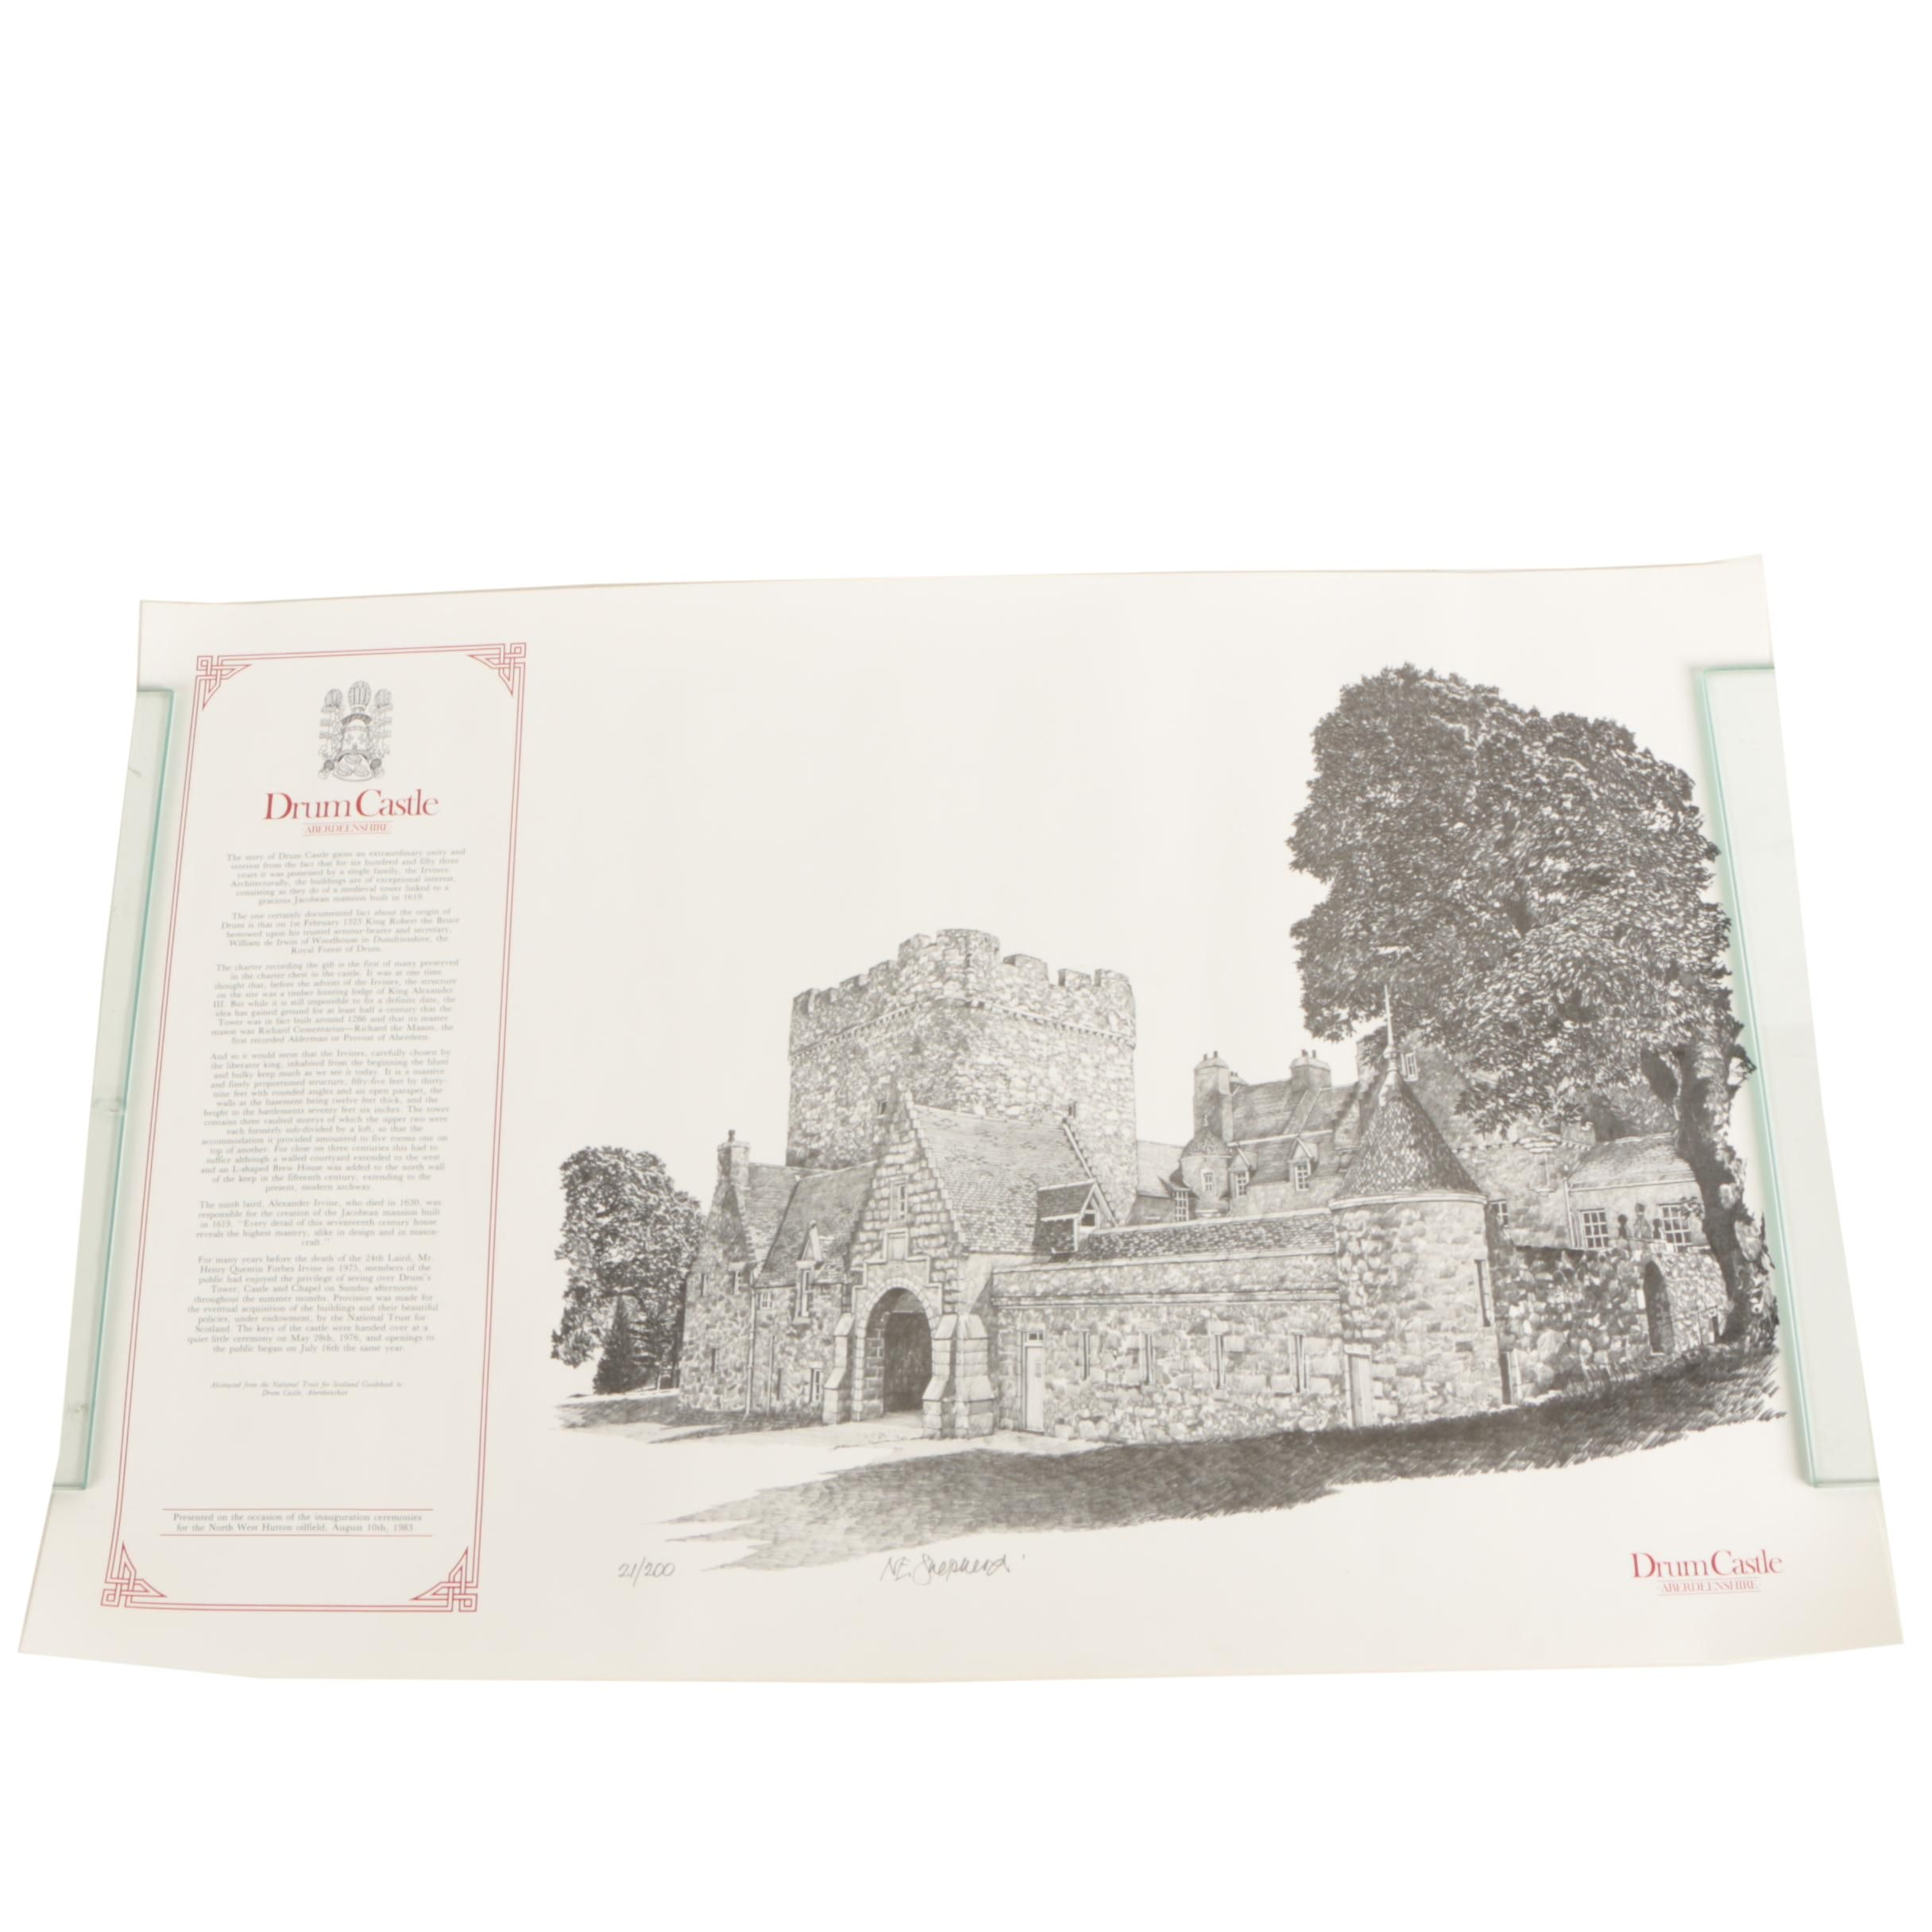 "N.E. Shepherd Limited Edition Halftone Print ""Drum Castle"""